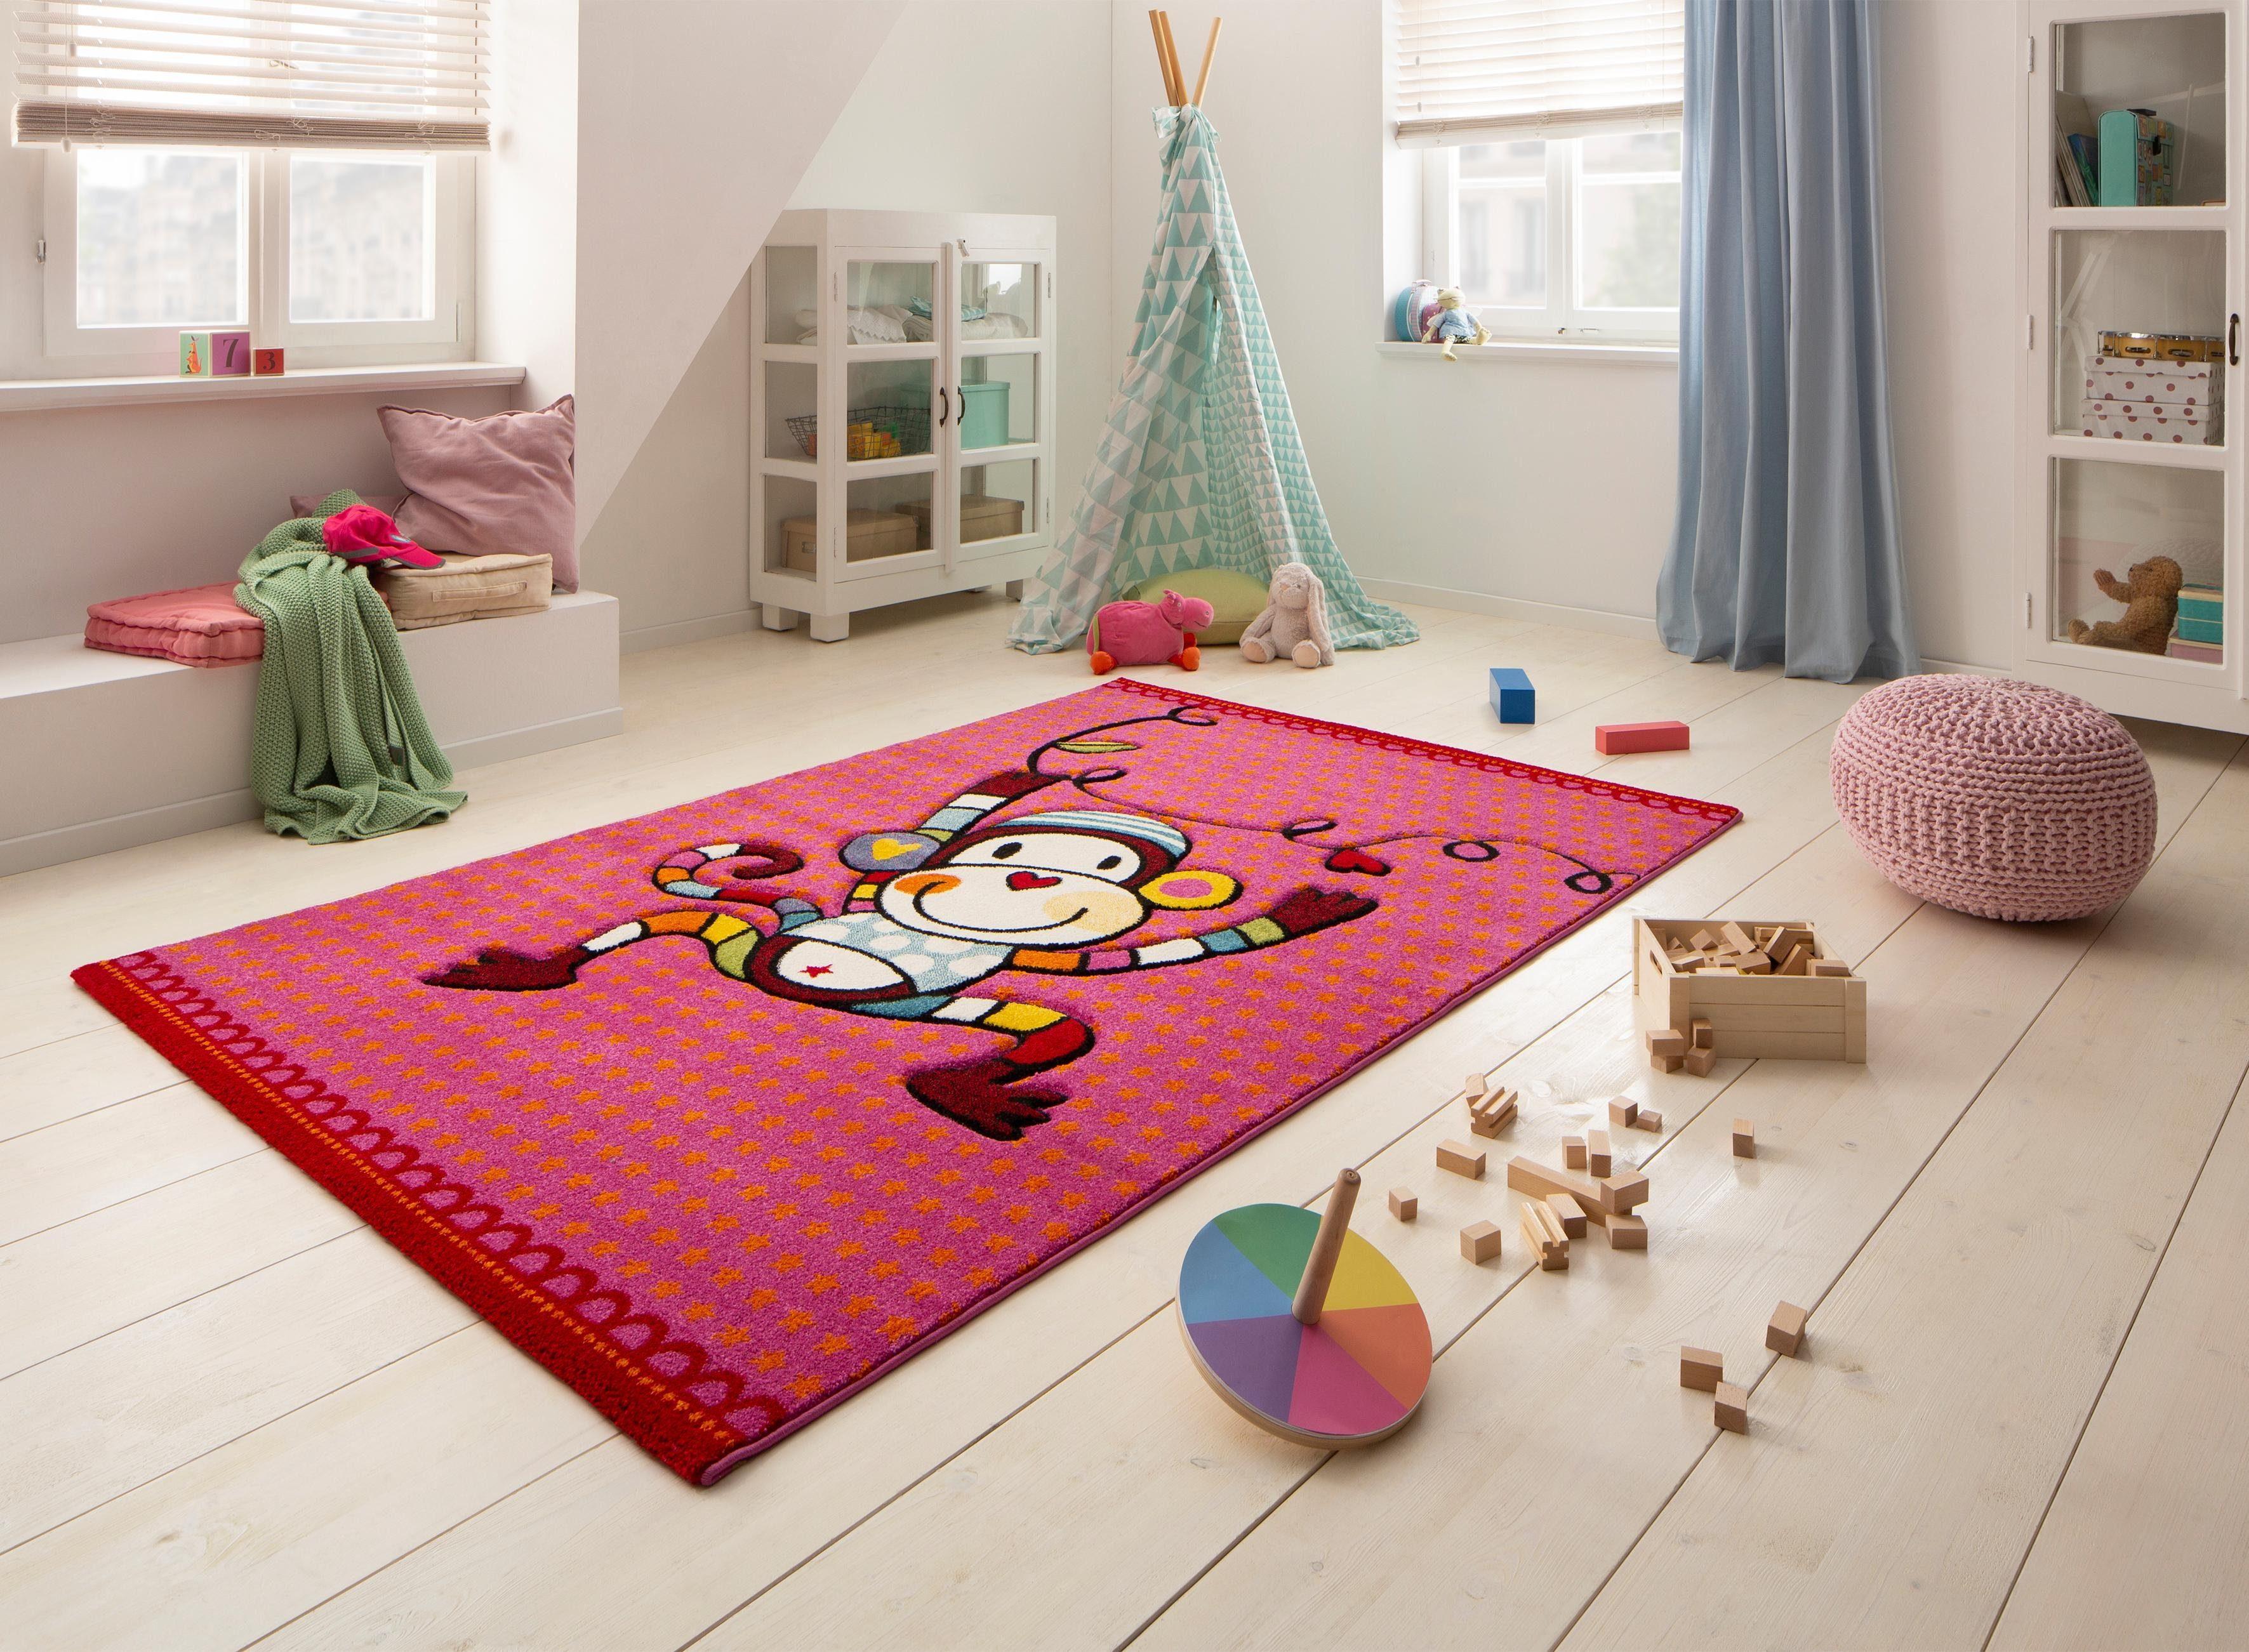 Vloerkleed Kinderkamer Roze : Vloerkleed voor de kinderkamer aap« lüttenhütt motiefmodel